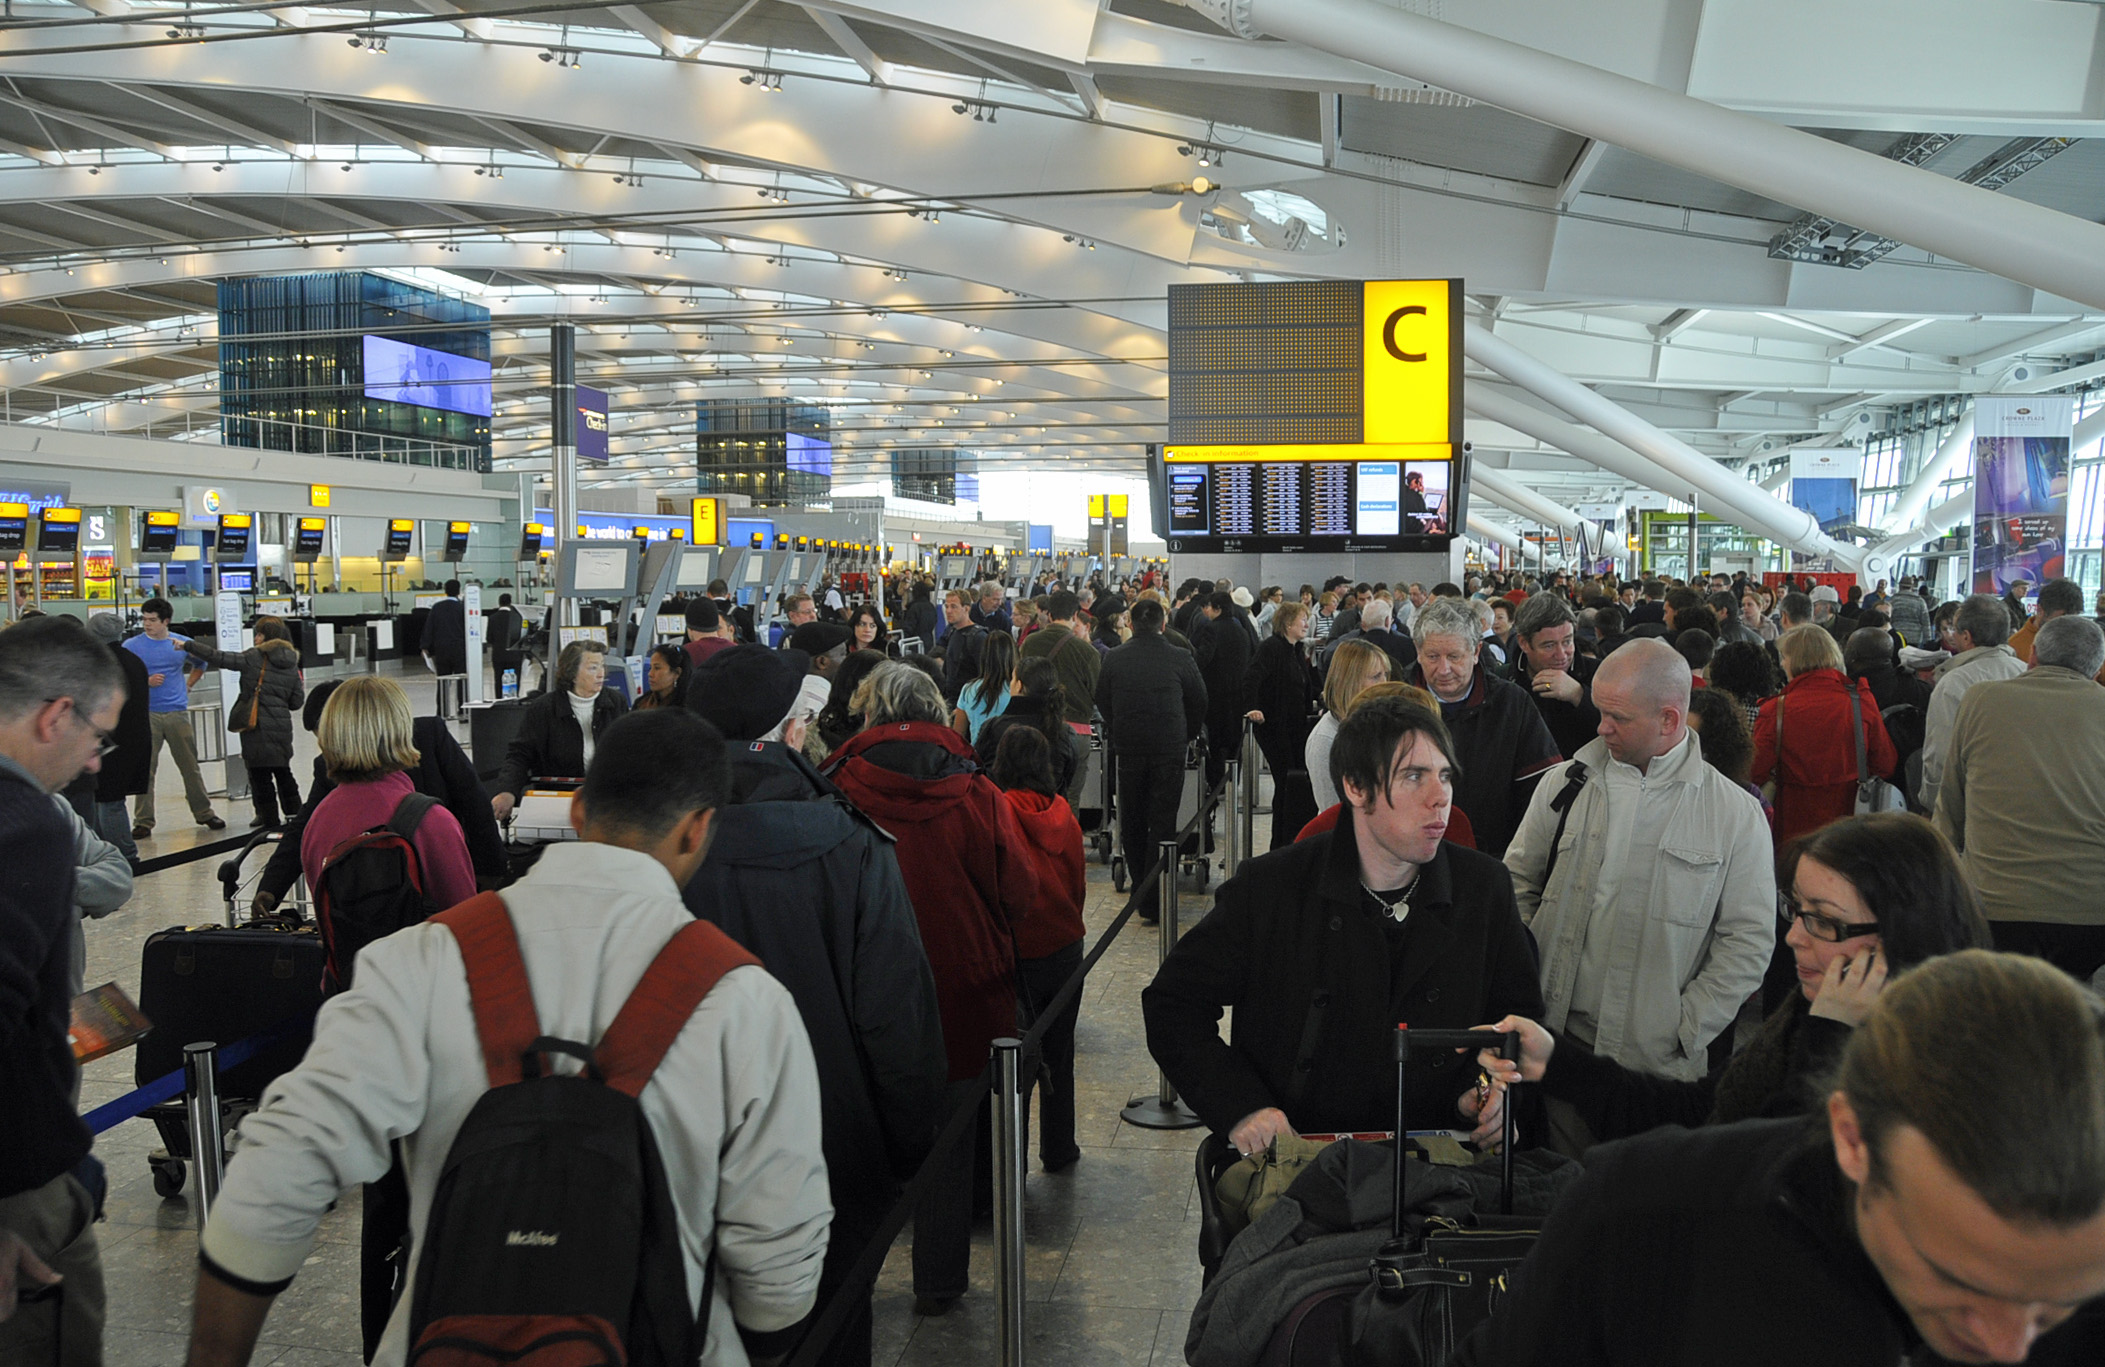 Aeroporto Heathrow Londra : Heathrow maltempo e neve sull aeroporto di londra